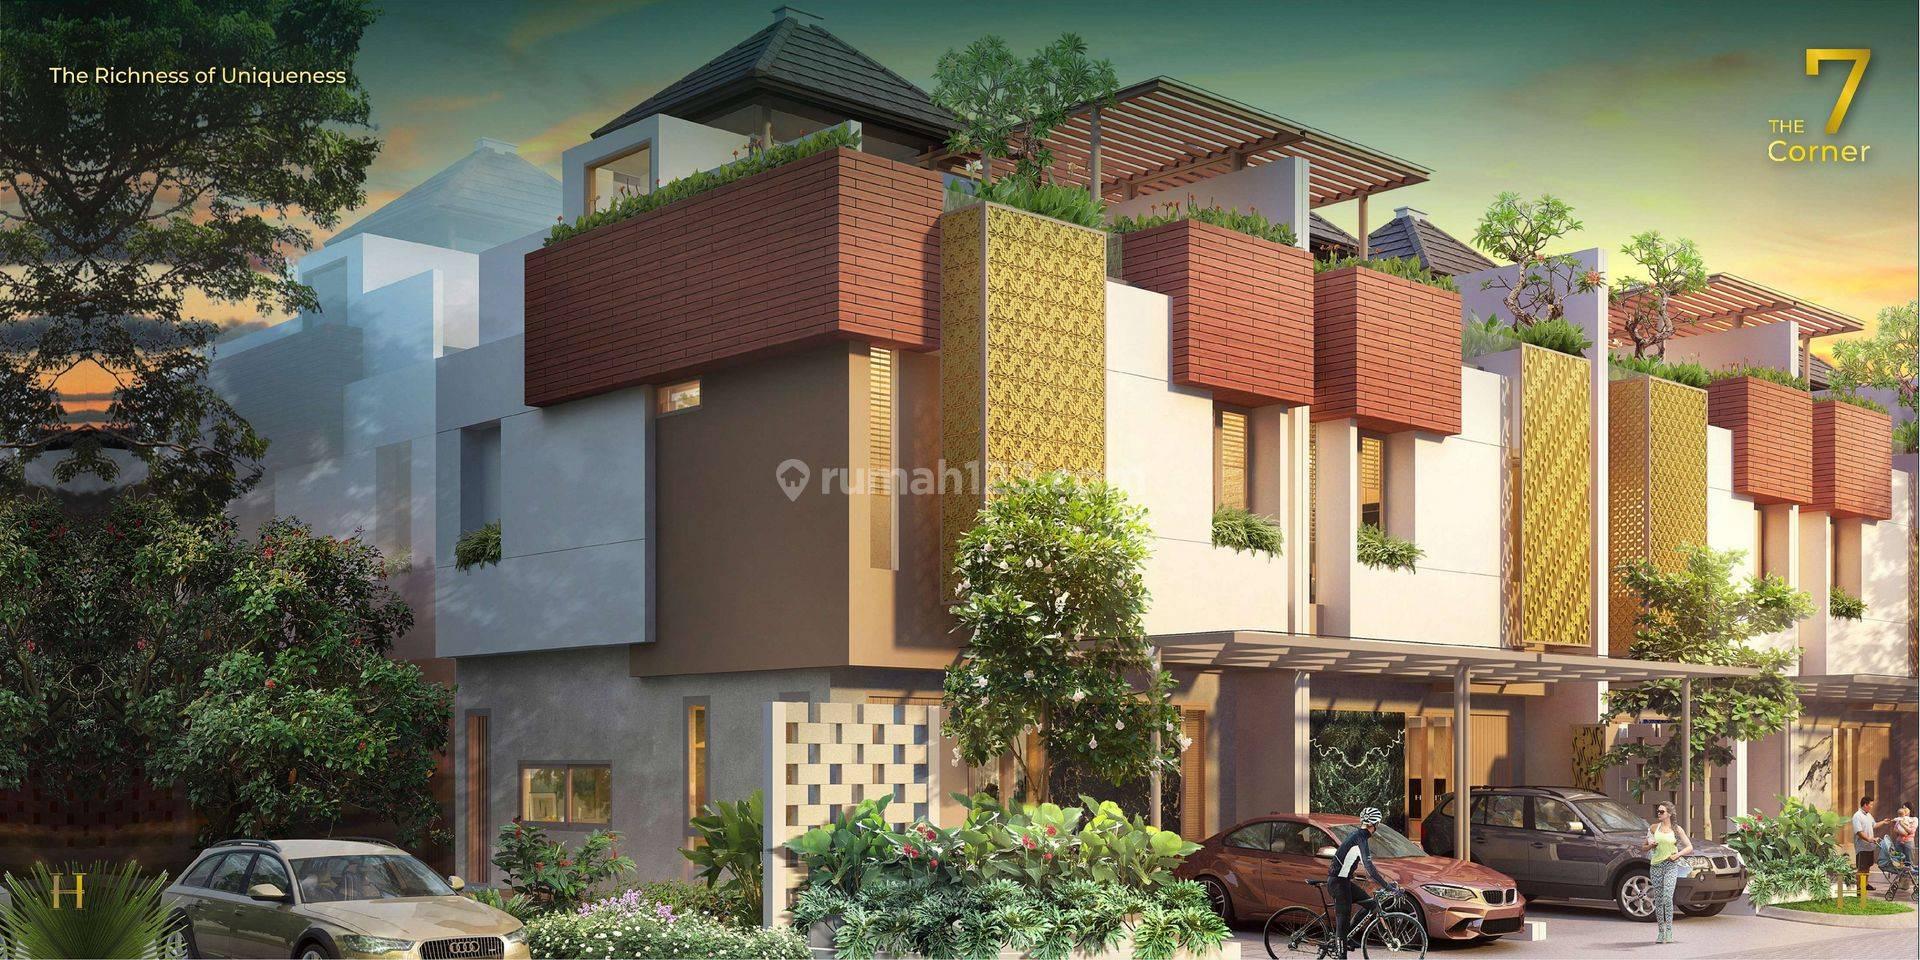 Heritage residence Puri 11 - The 7 Coner